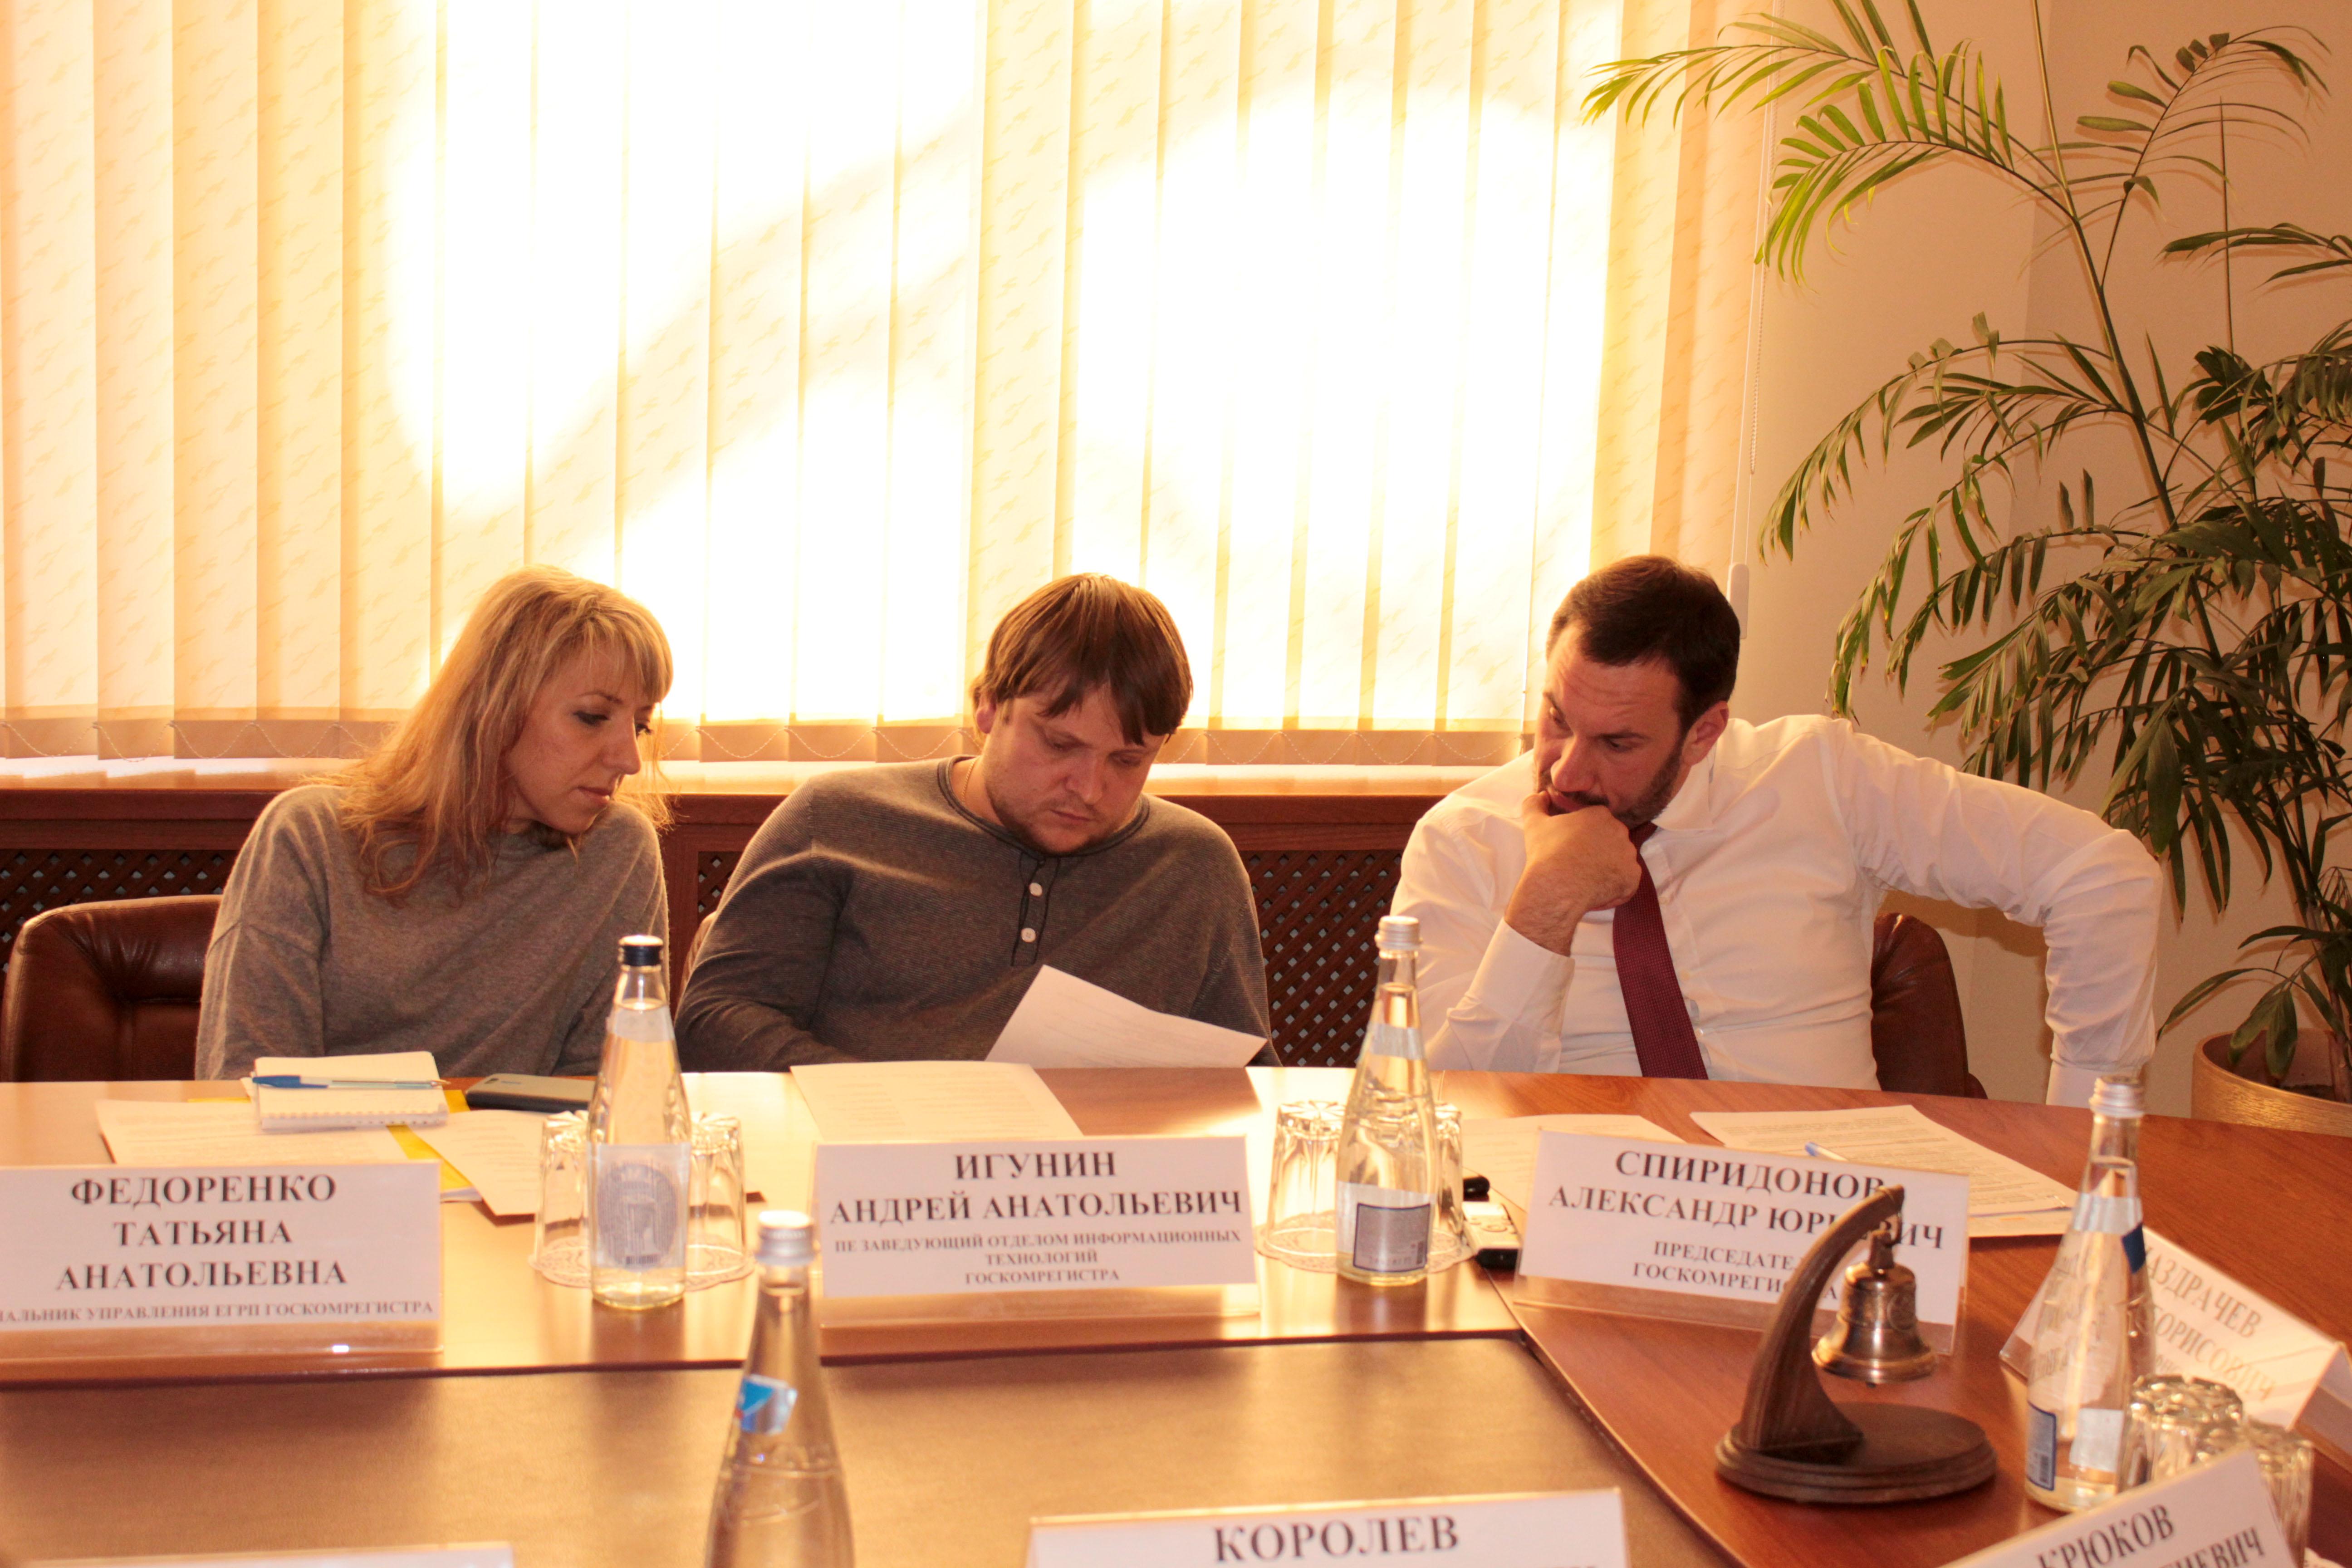 Тараканова татьяна анатольевна, Татьяна Анатольевна Тараканова(Сыченикова) 25 фотография